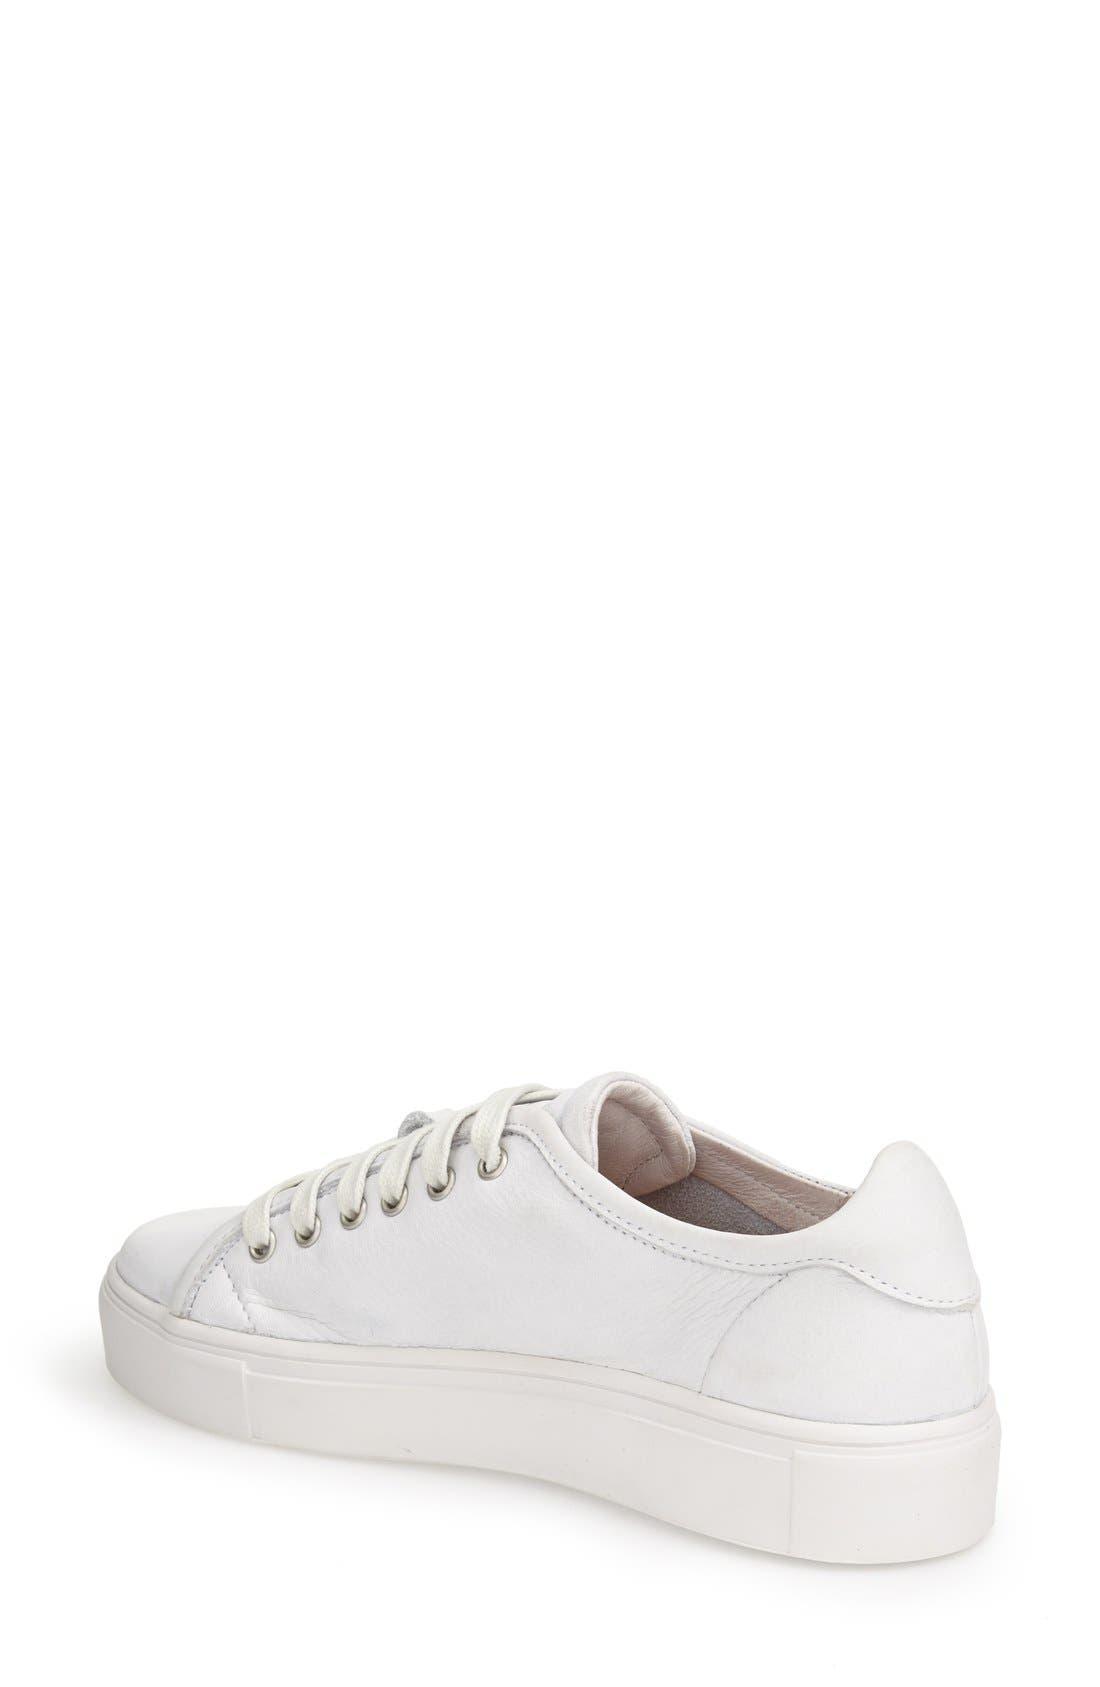 Alternate Image 2  - Blackstone 'LL64' Sneaker (Women)